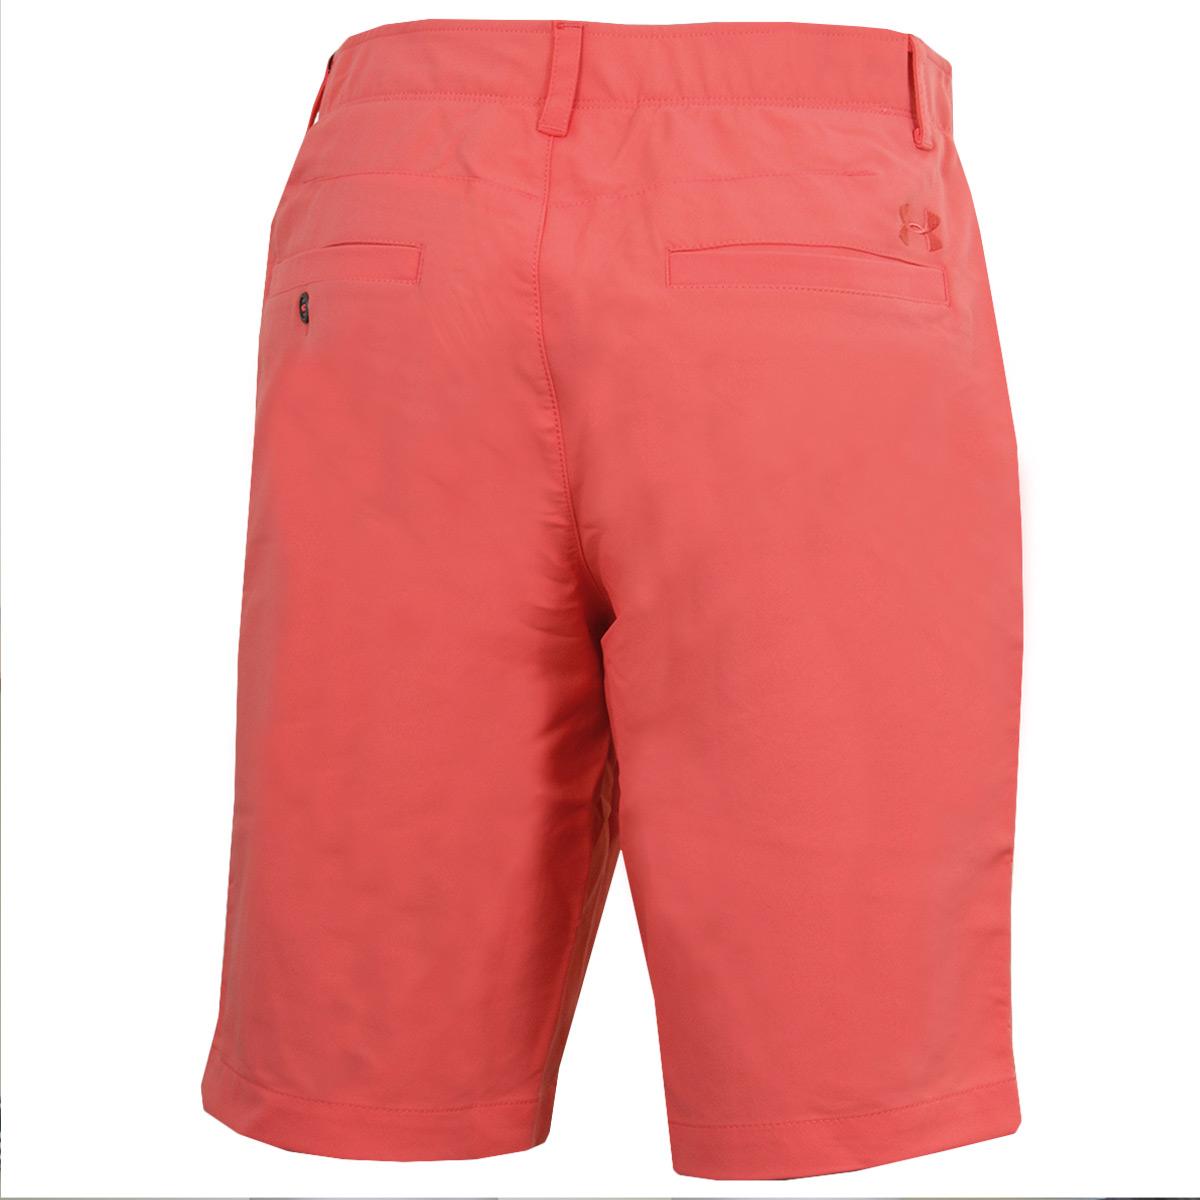 Under-Armour-Homme-UA-Match-Play-conique-Tech-Performance-Golf-Shorts-29-off-RRP miniature 23